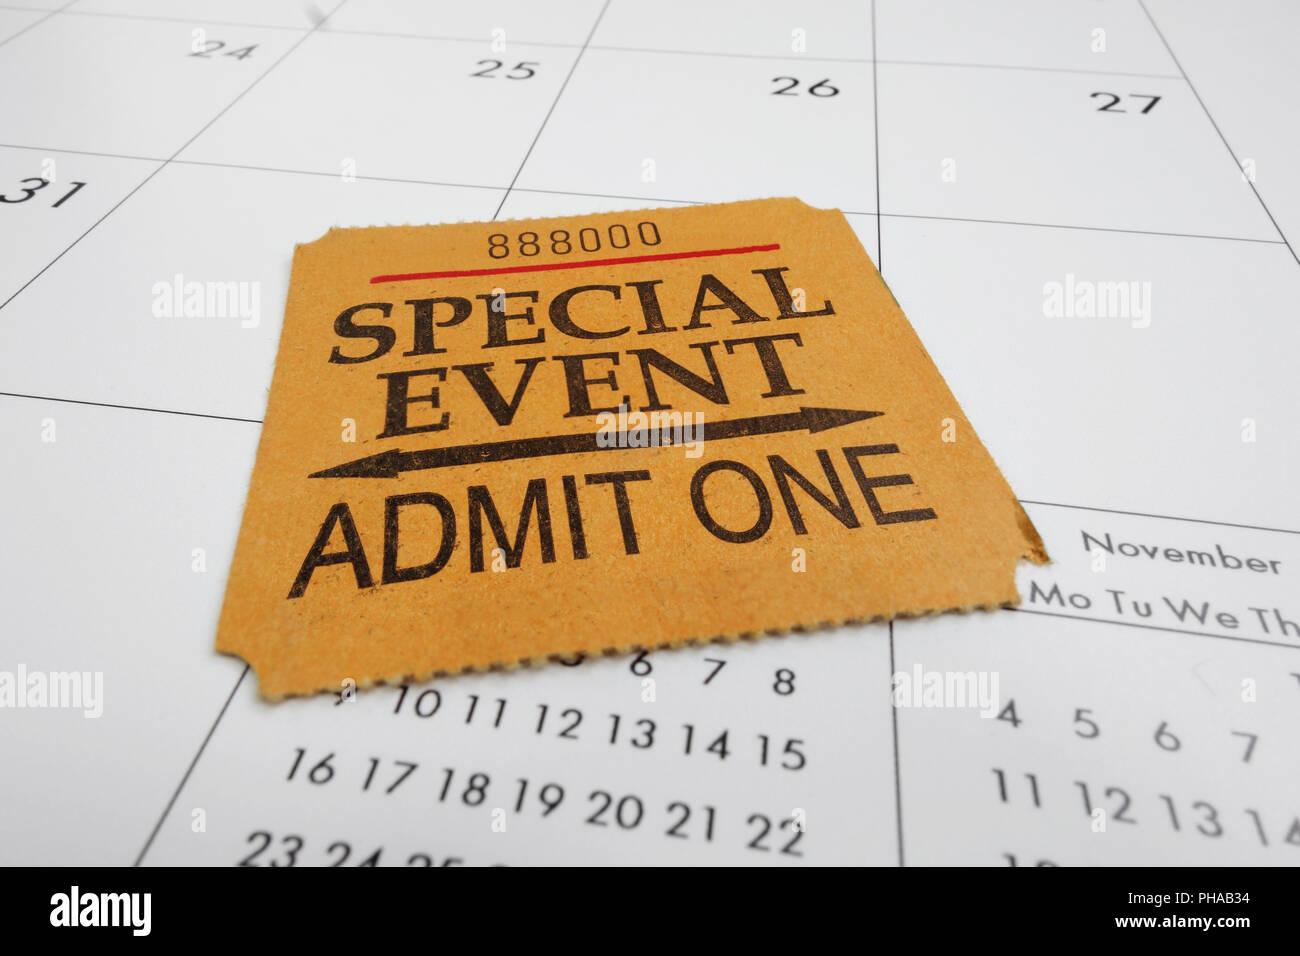 ticket stub - Stock Image